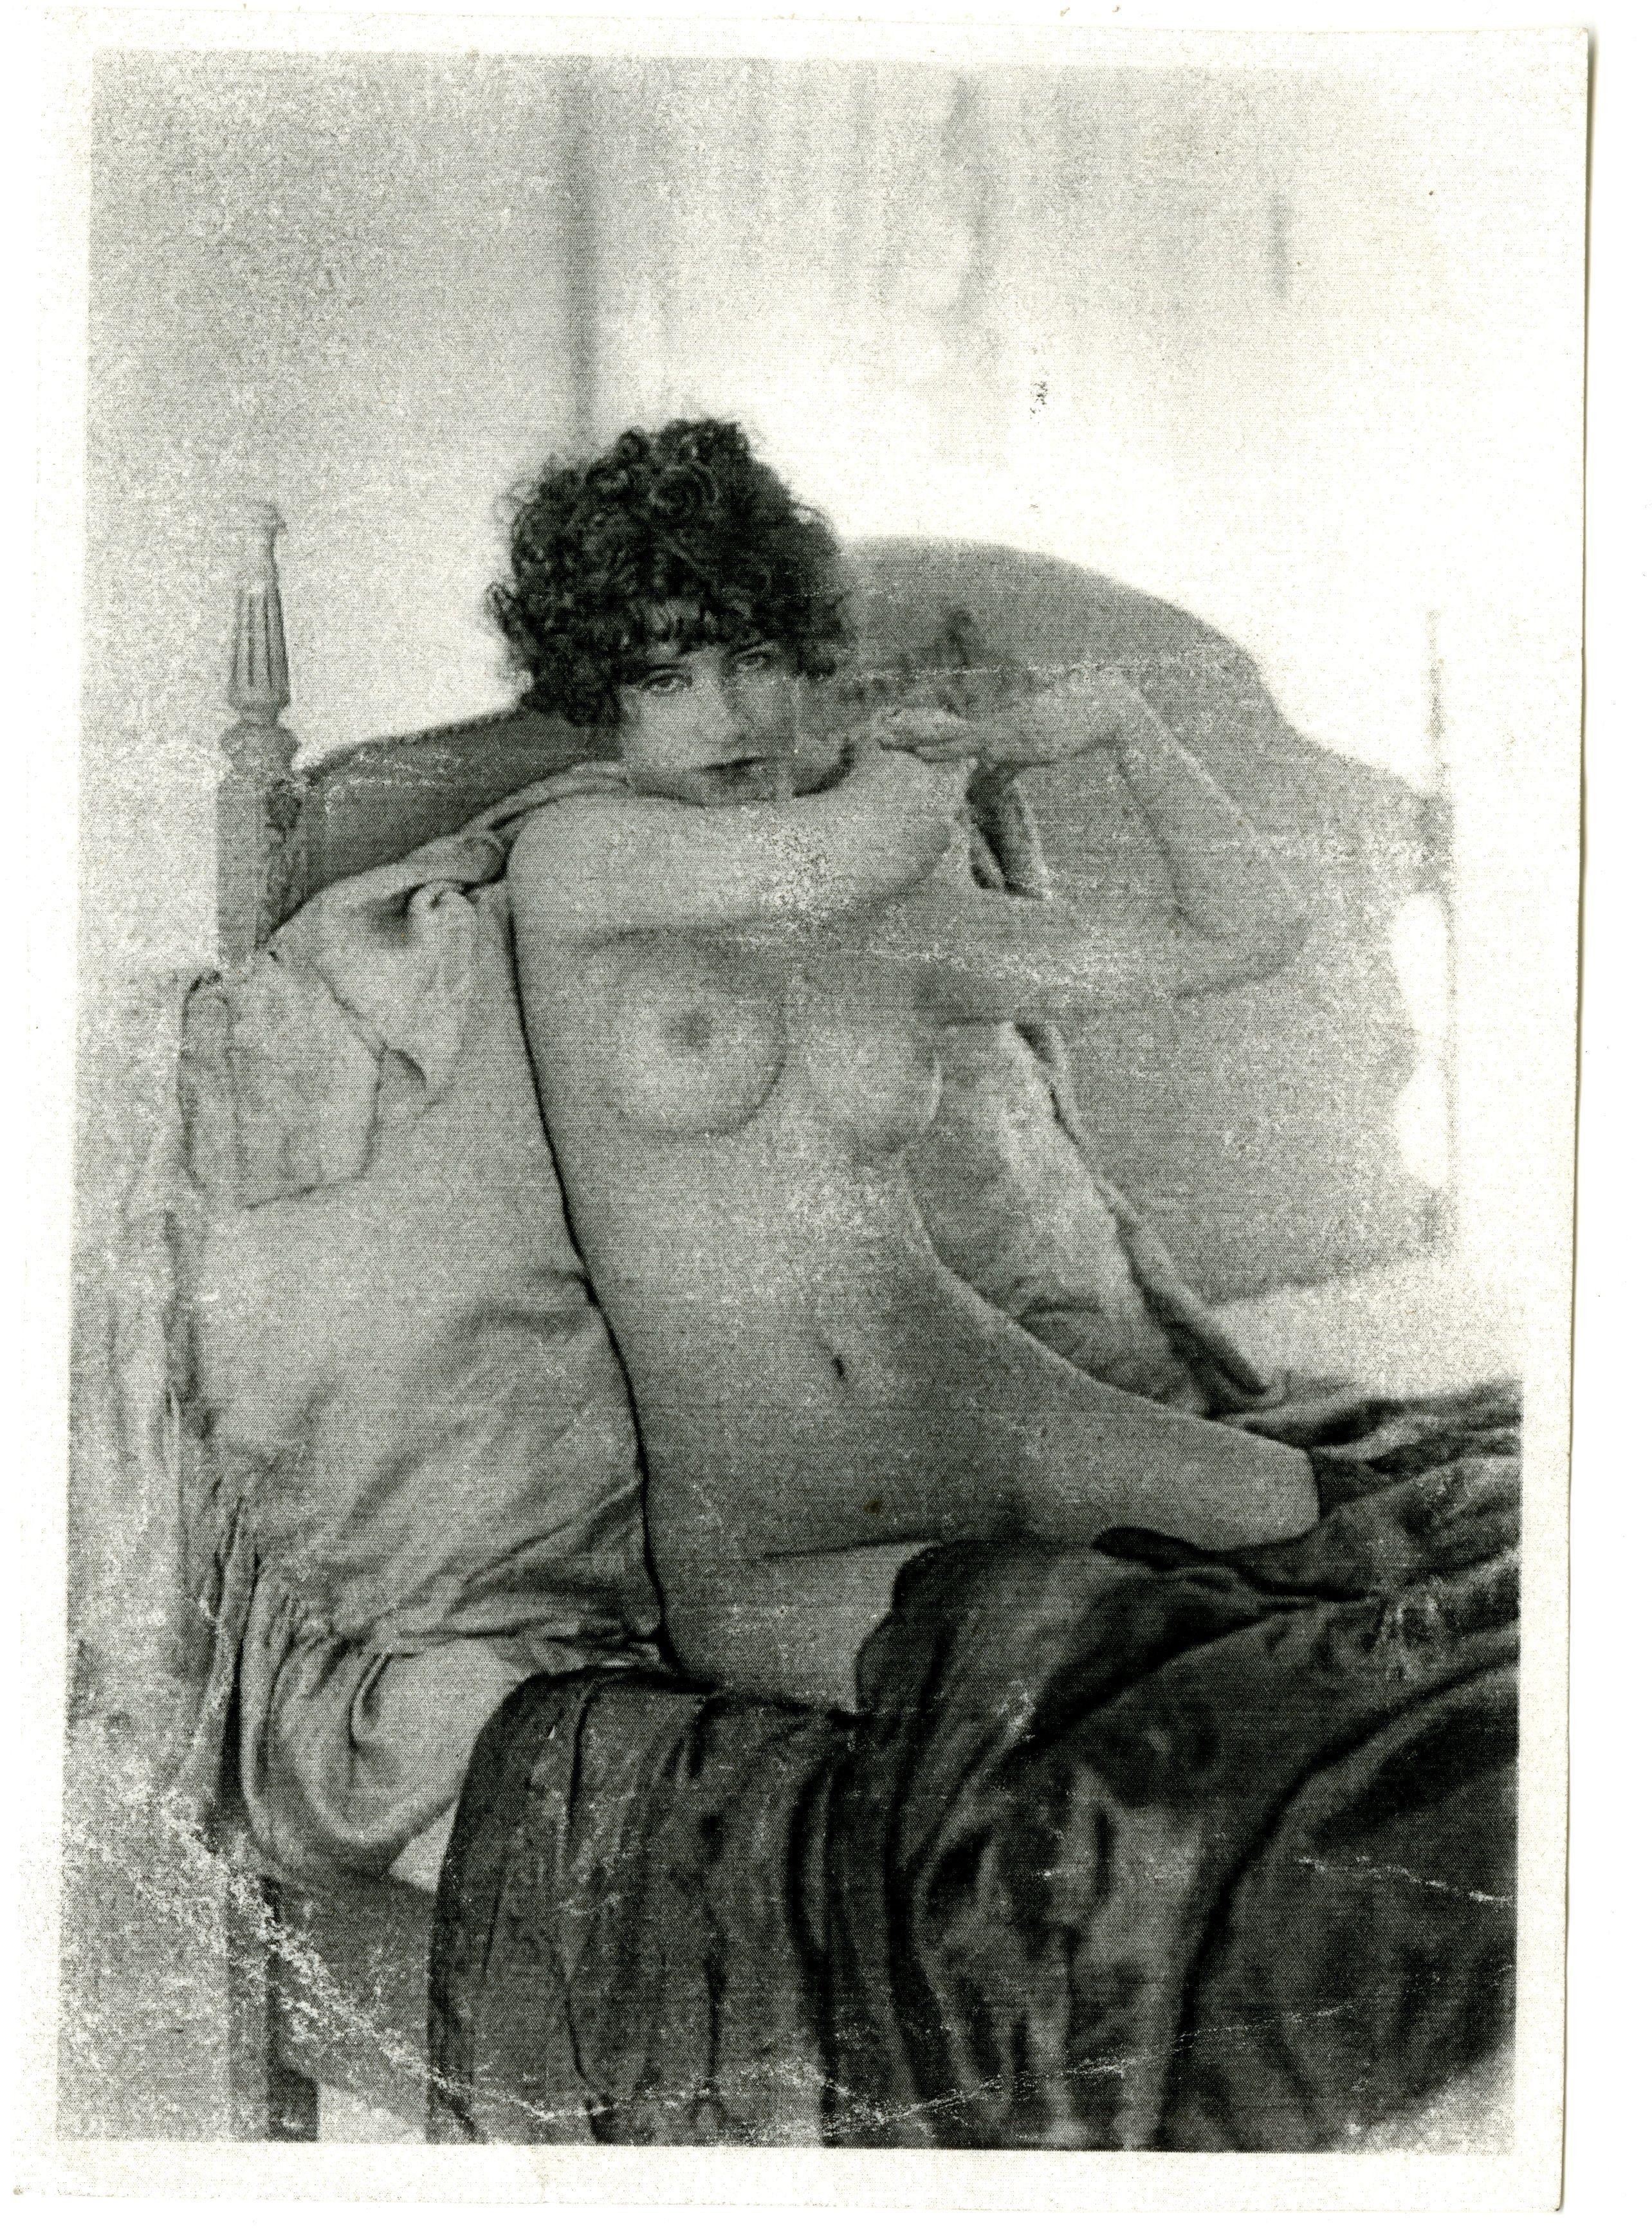 Asian Porn In The Victorian Era victorian porn srories - xxx photo